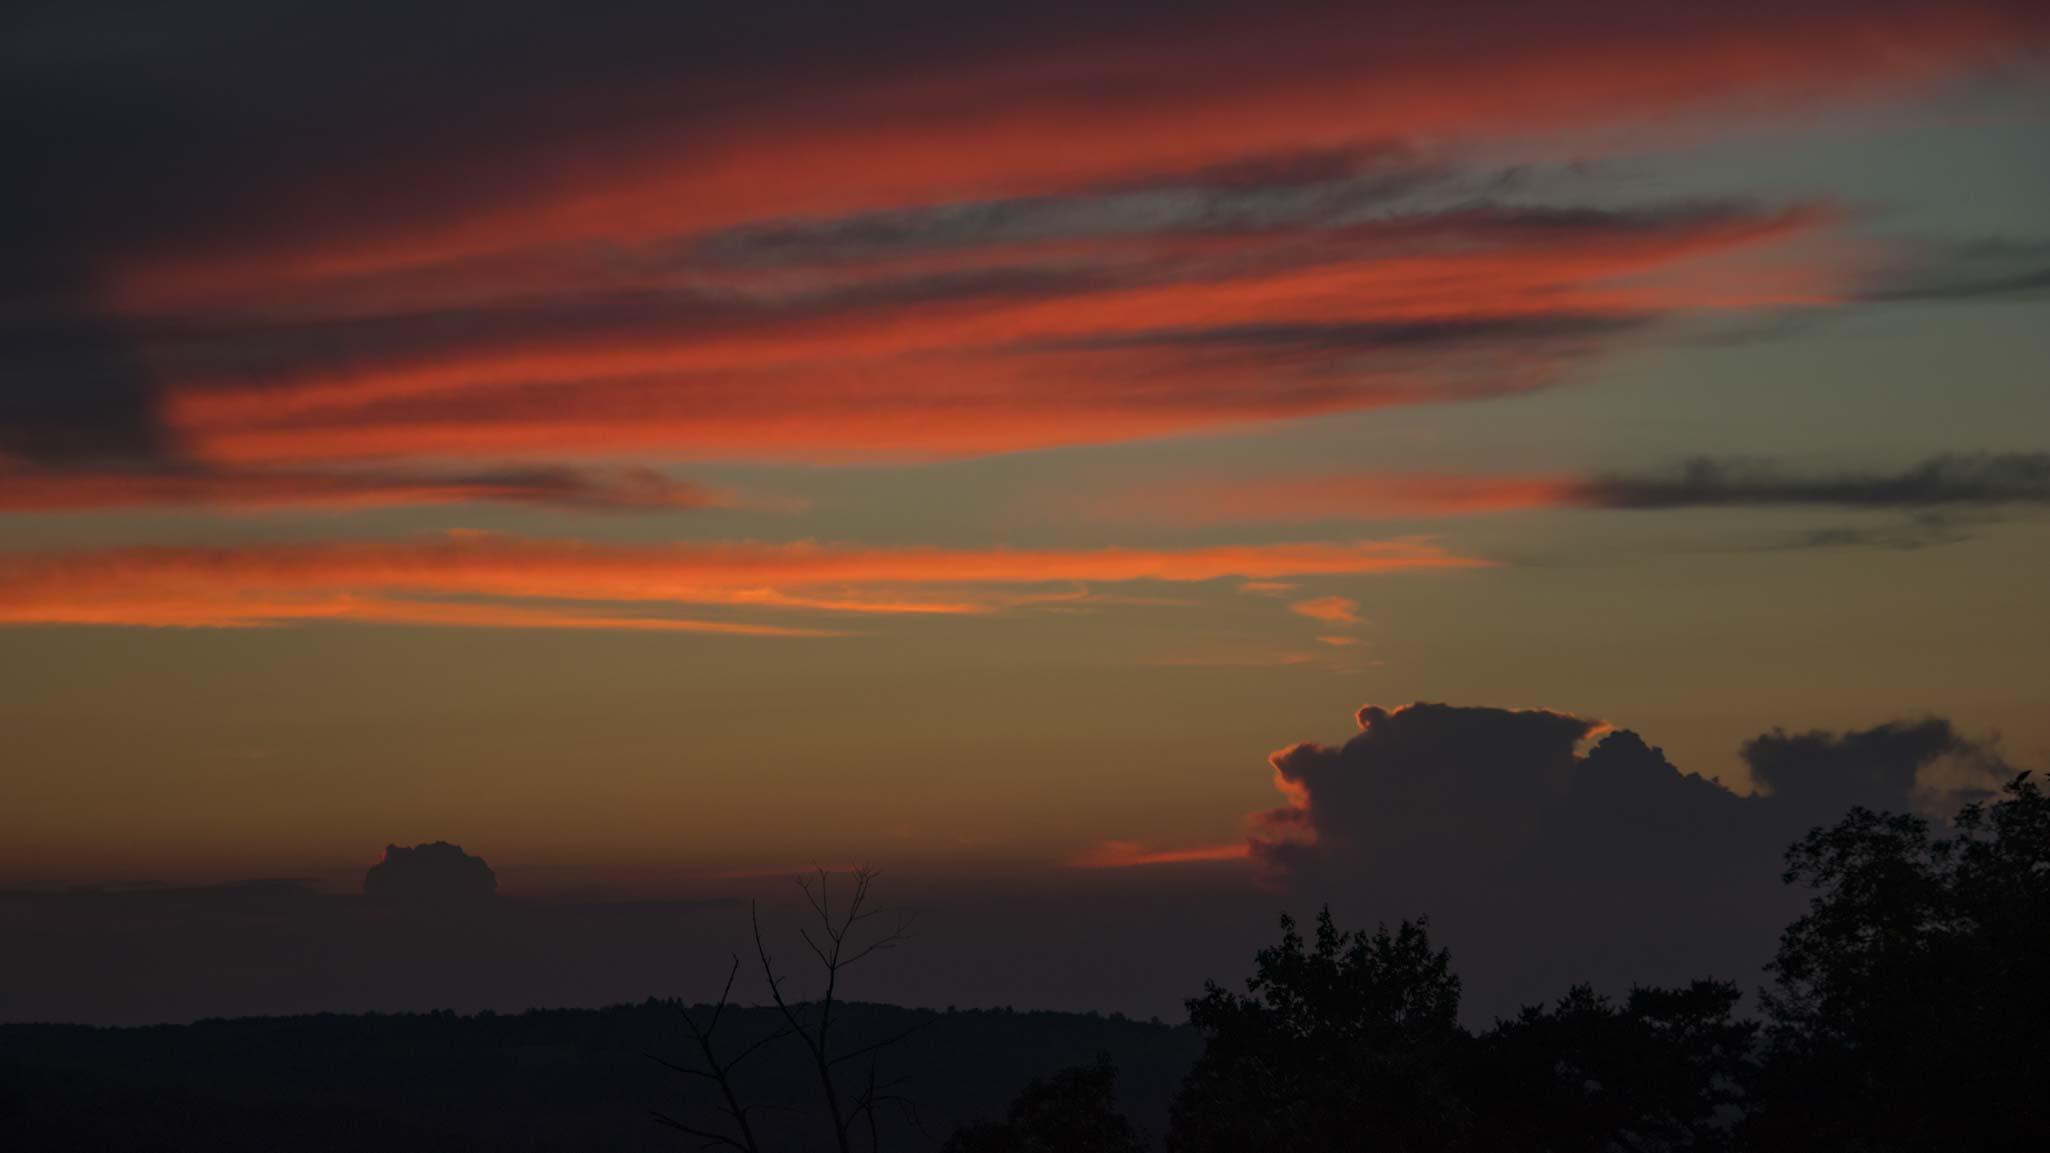 0802 Sunset 2 (1 of 1)